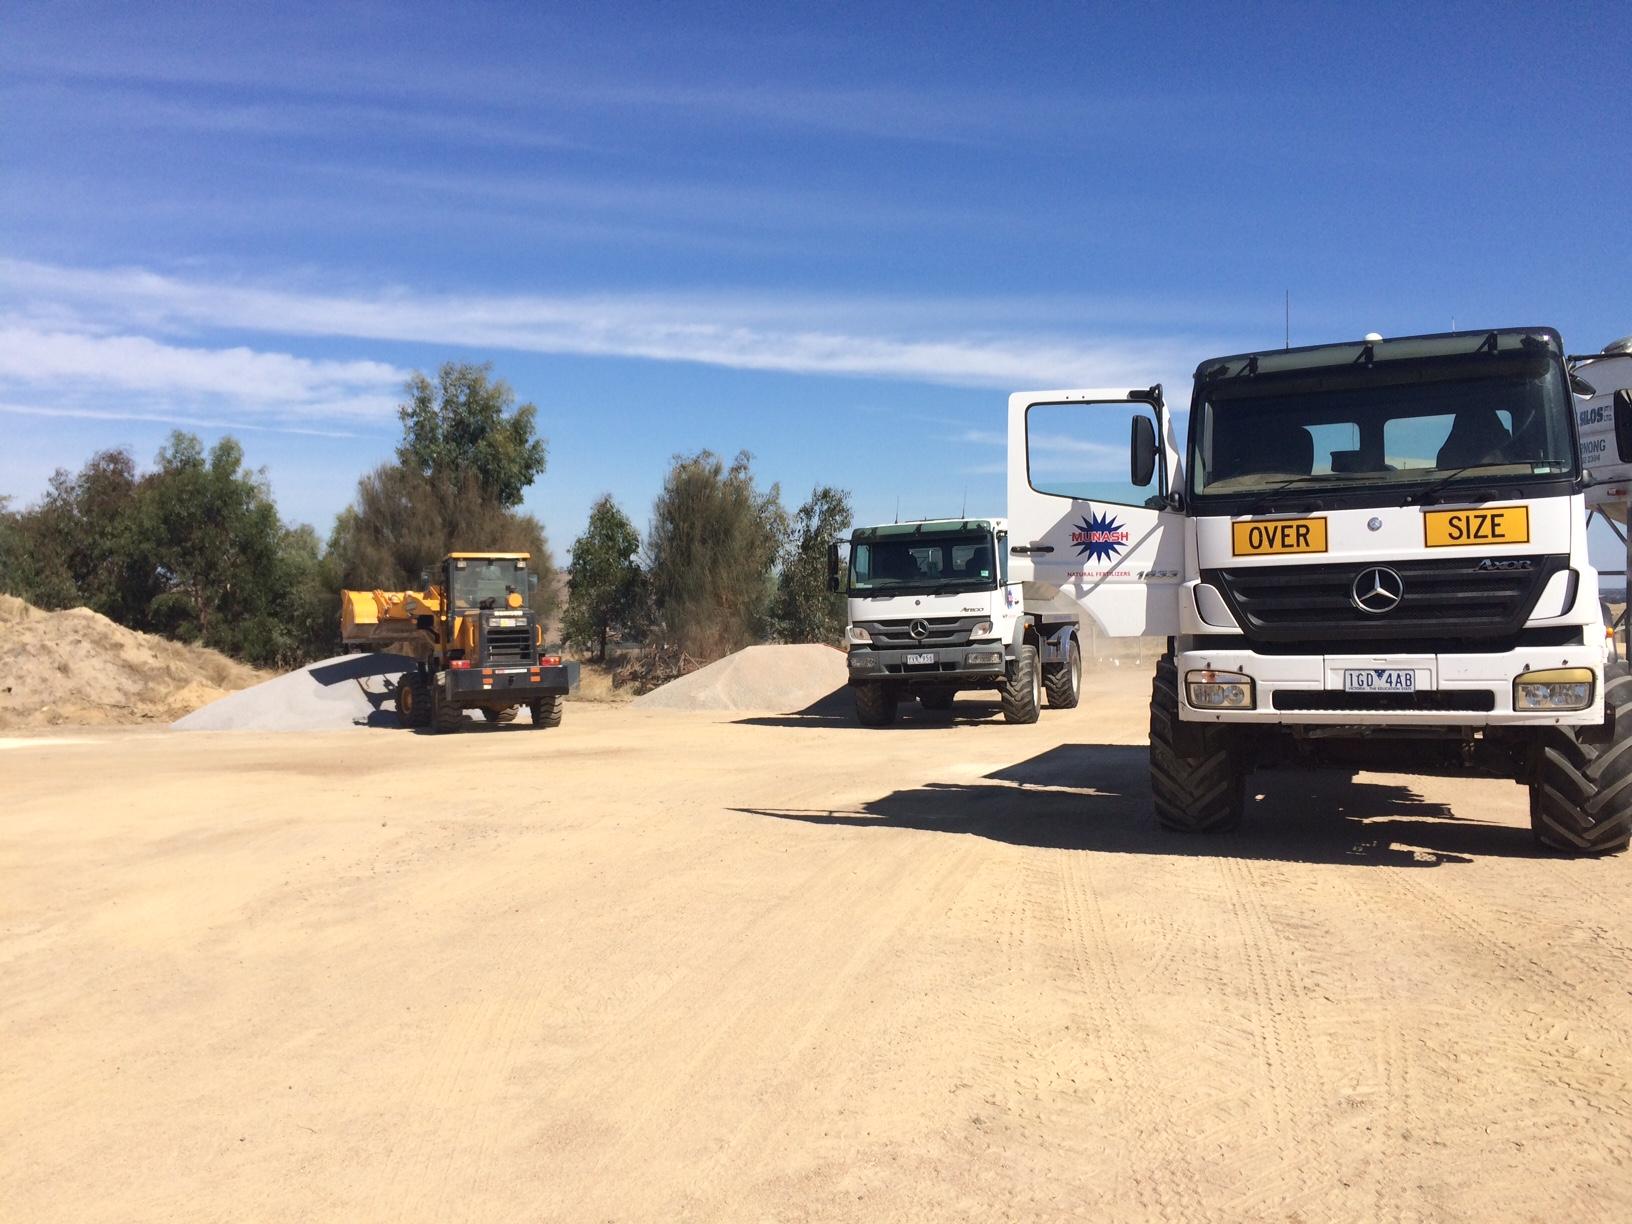 Loading of fertilizer onto the spreader truck